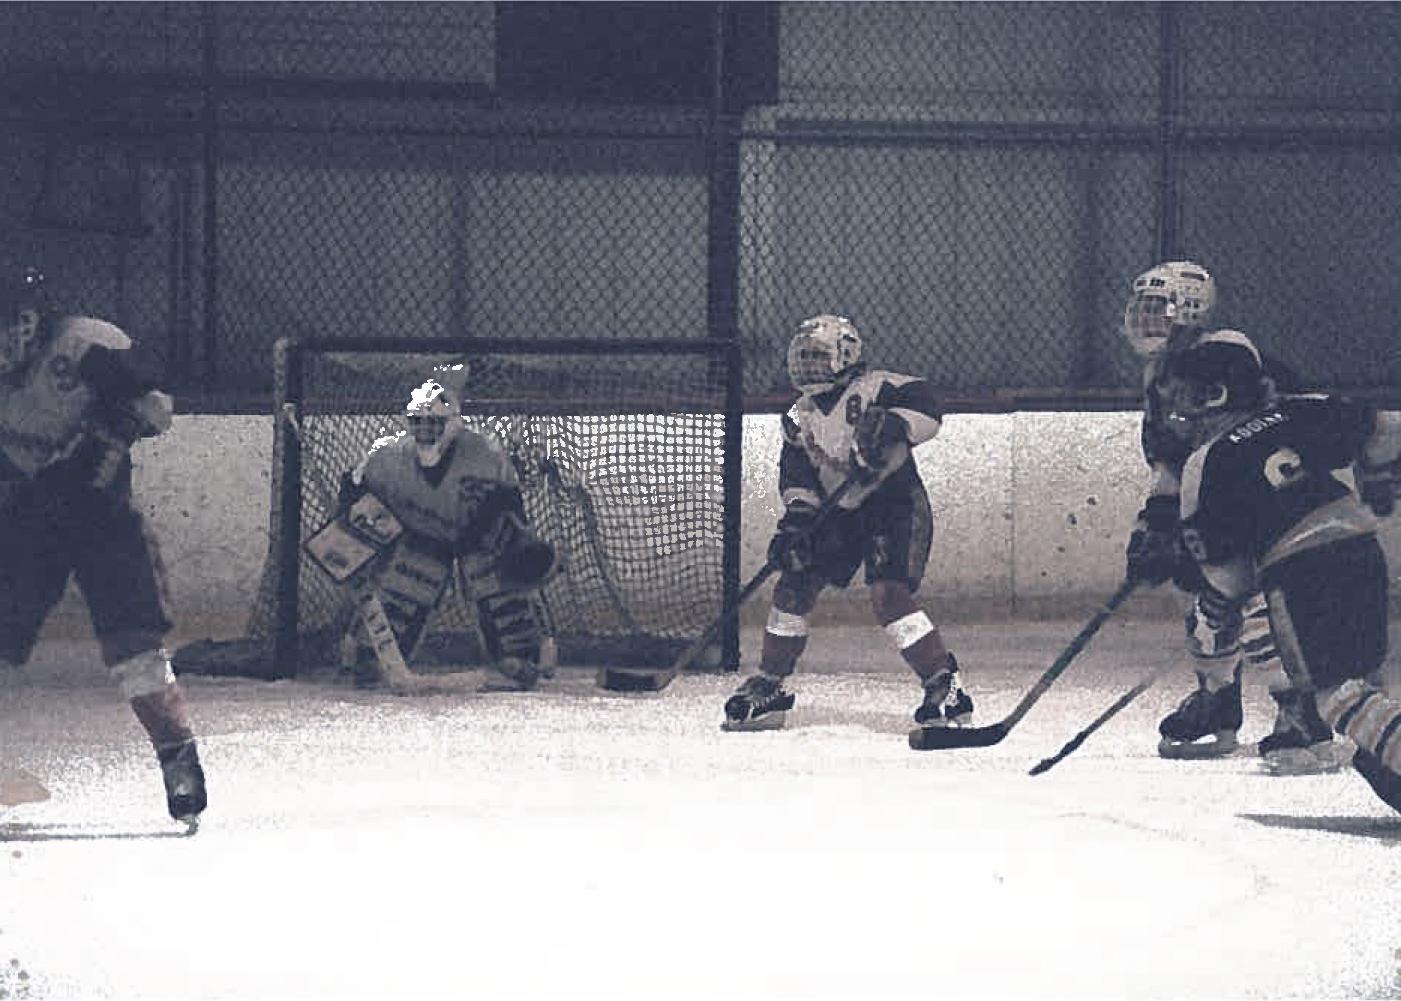 George Vavaroutsos playing hockey.